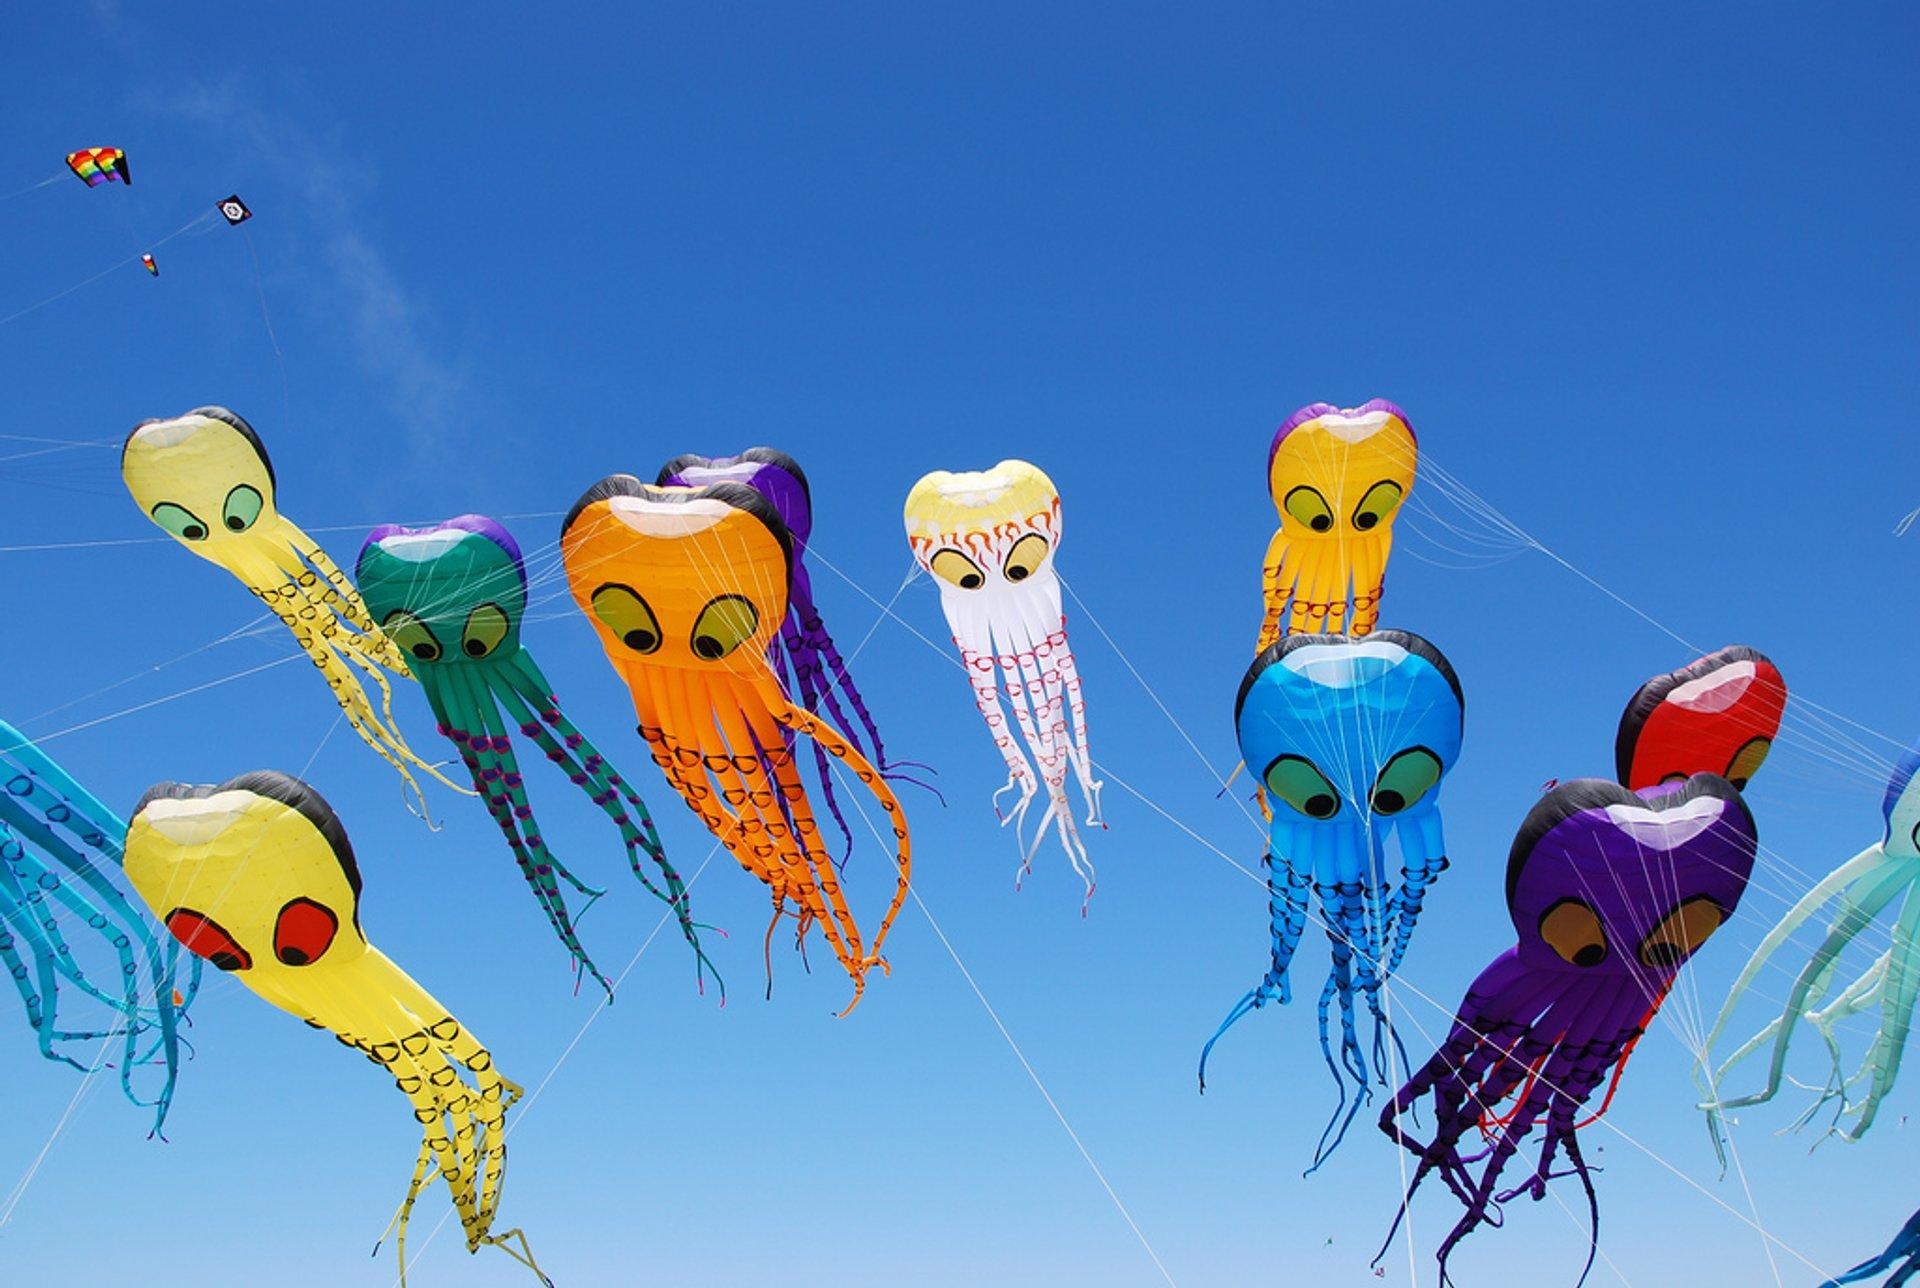 Berkeley Kite Festival in San Francisco 2020 - Best Time